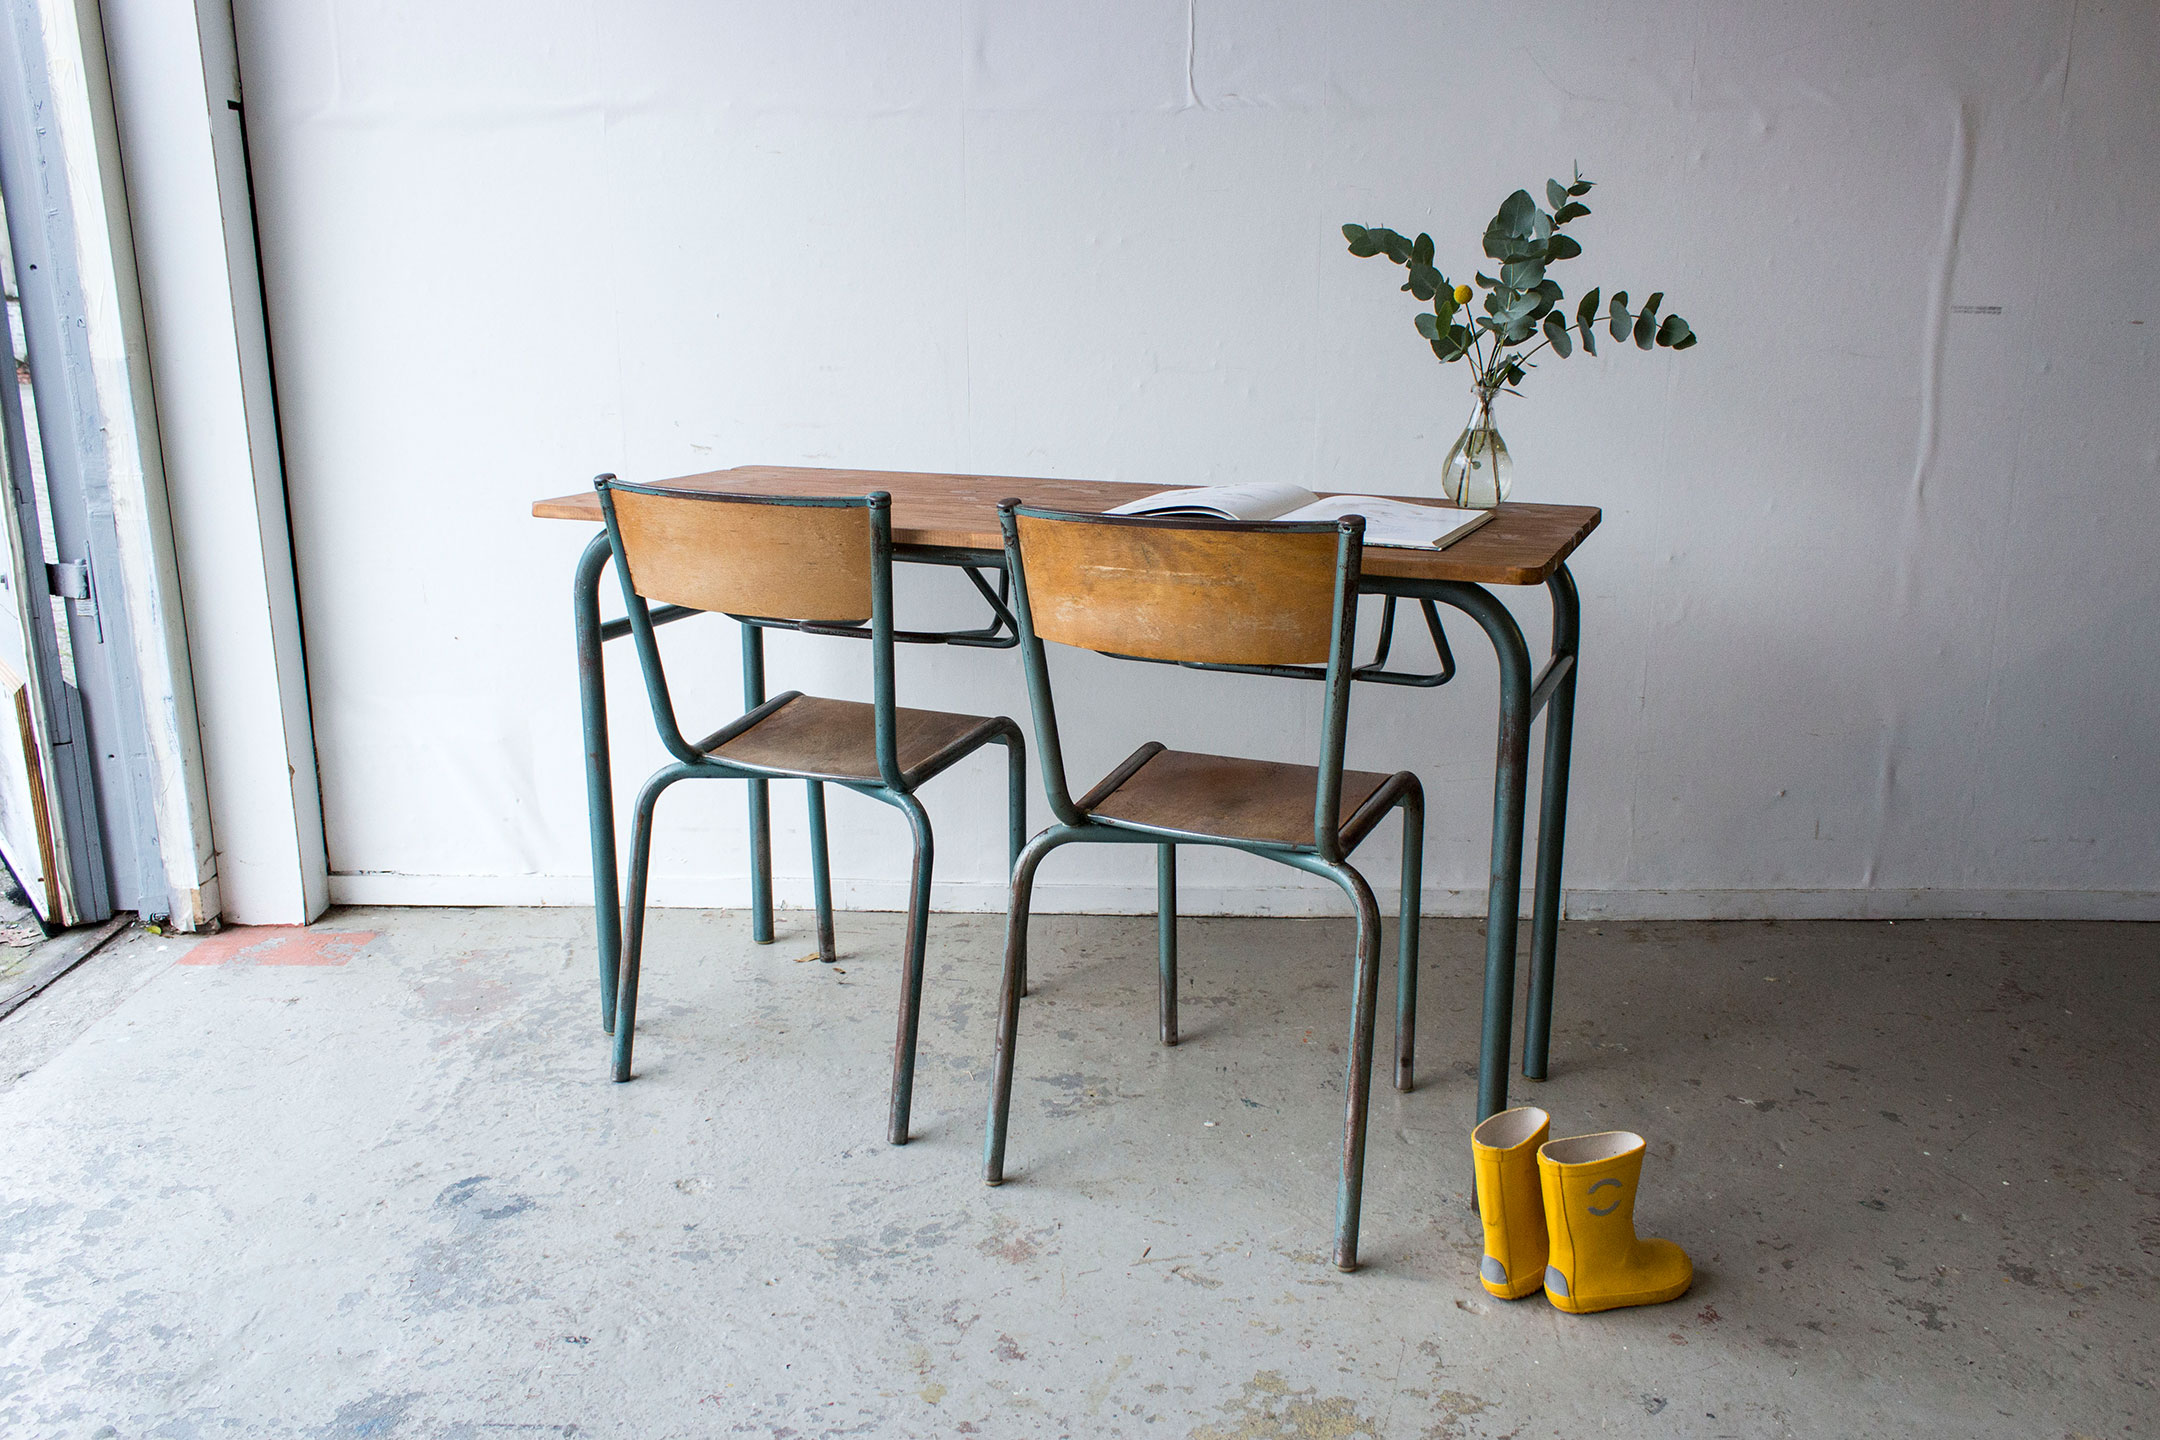 3170---vintage-schooltafel-grijsgroen-frame---Firma-zoethout.jpg